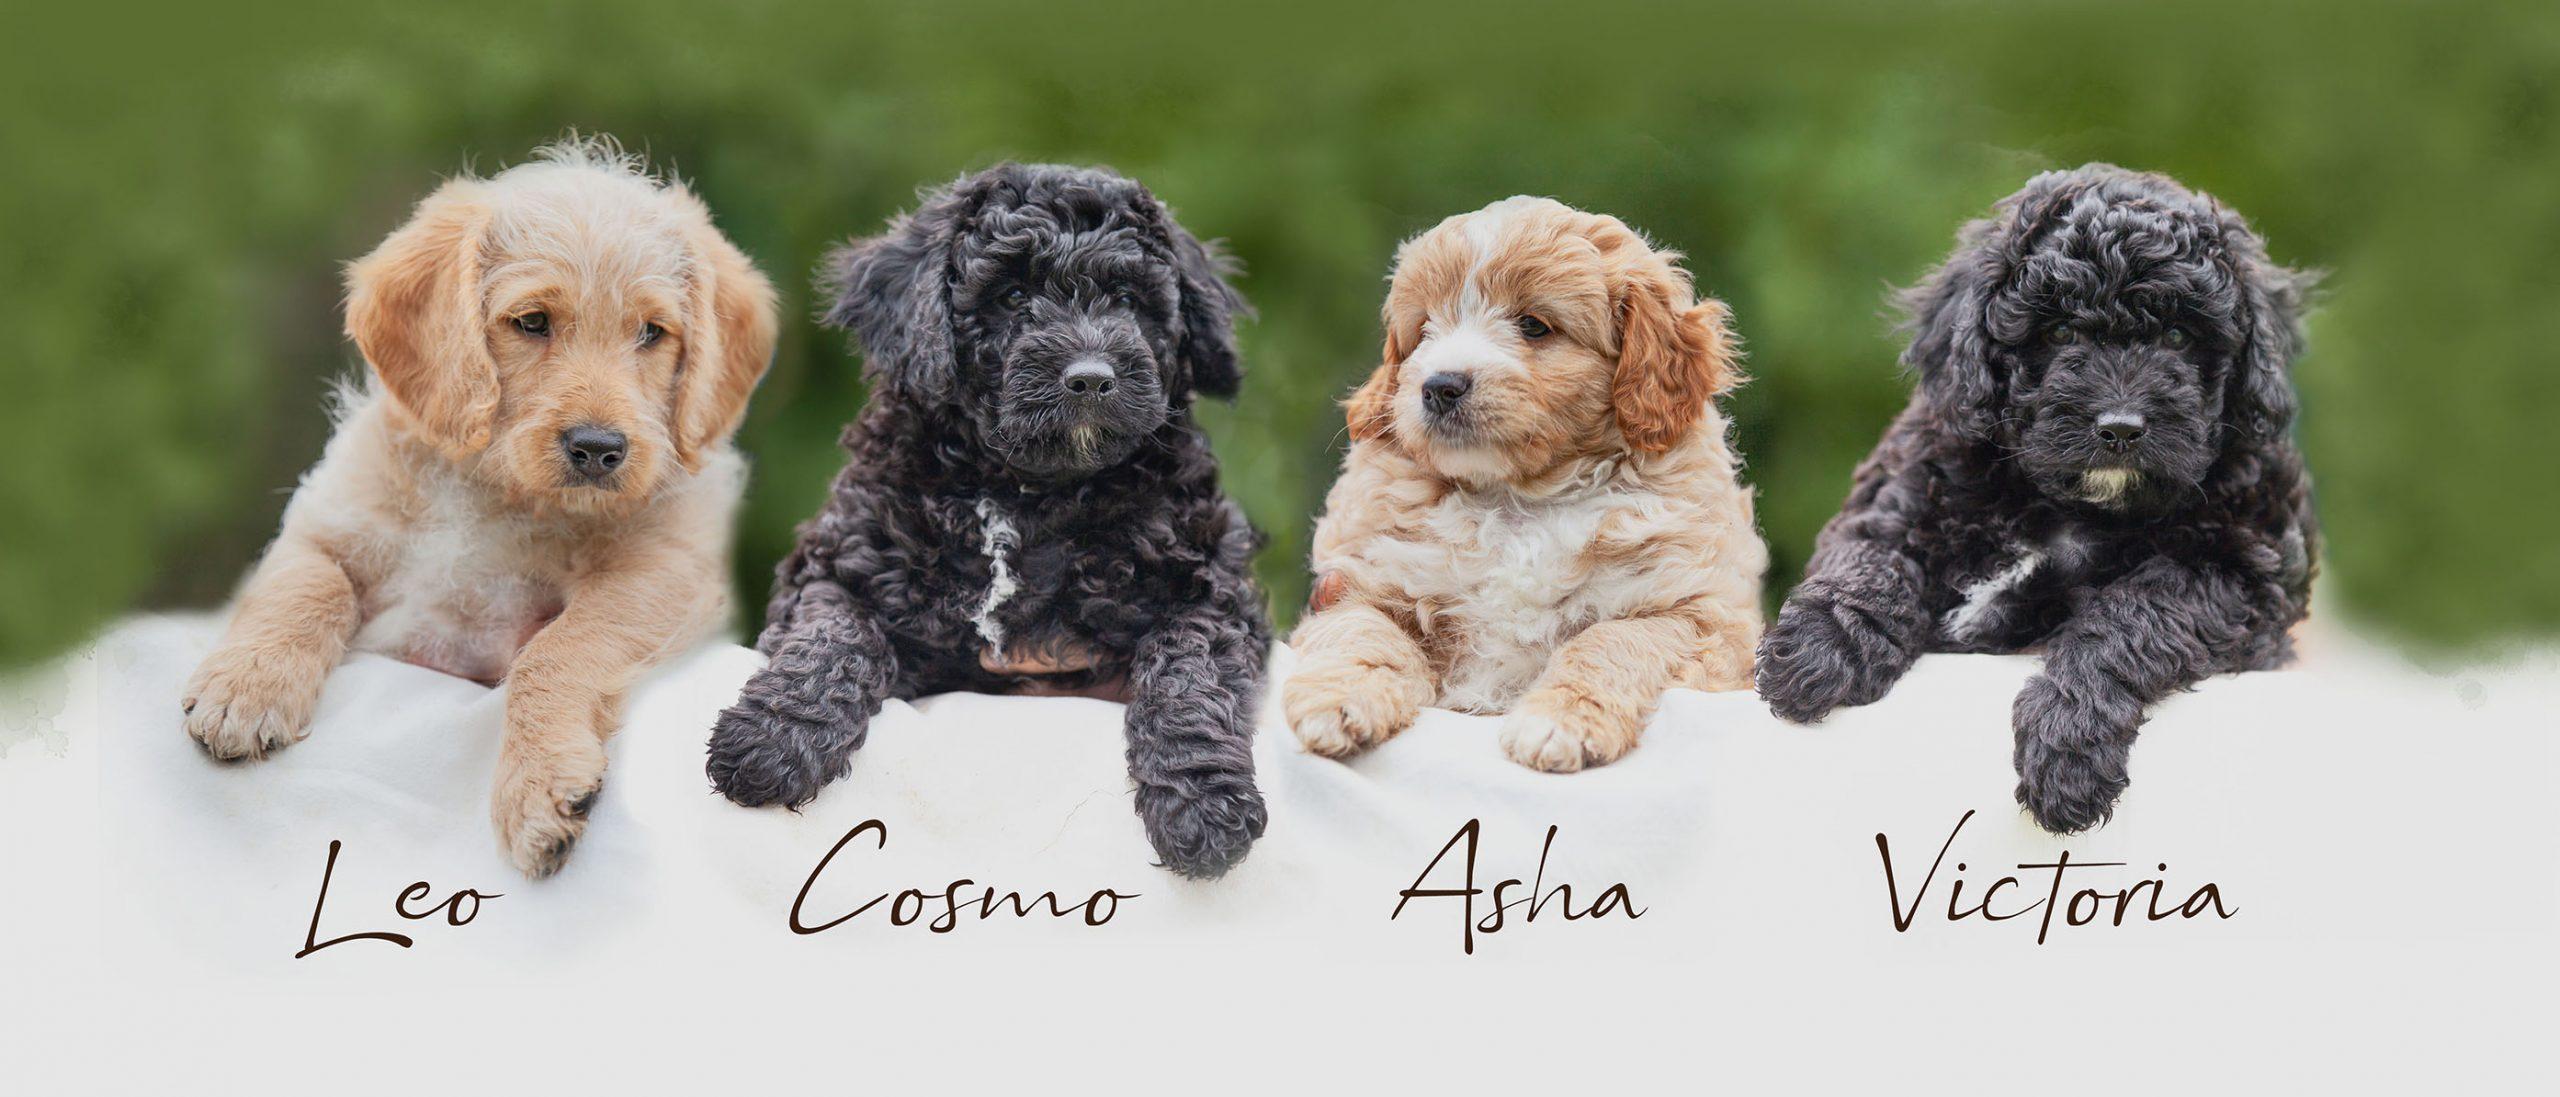 all the pups.jpg ed